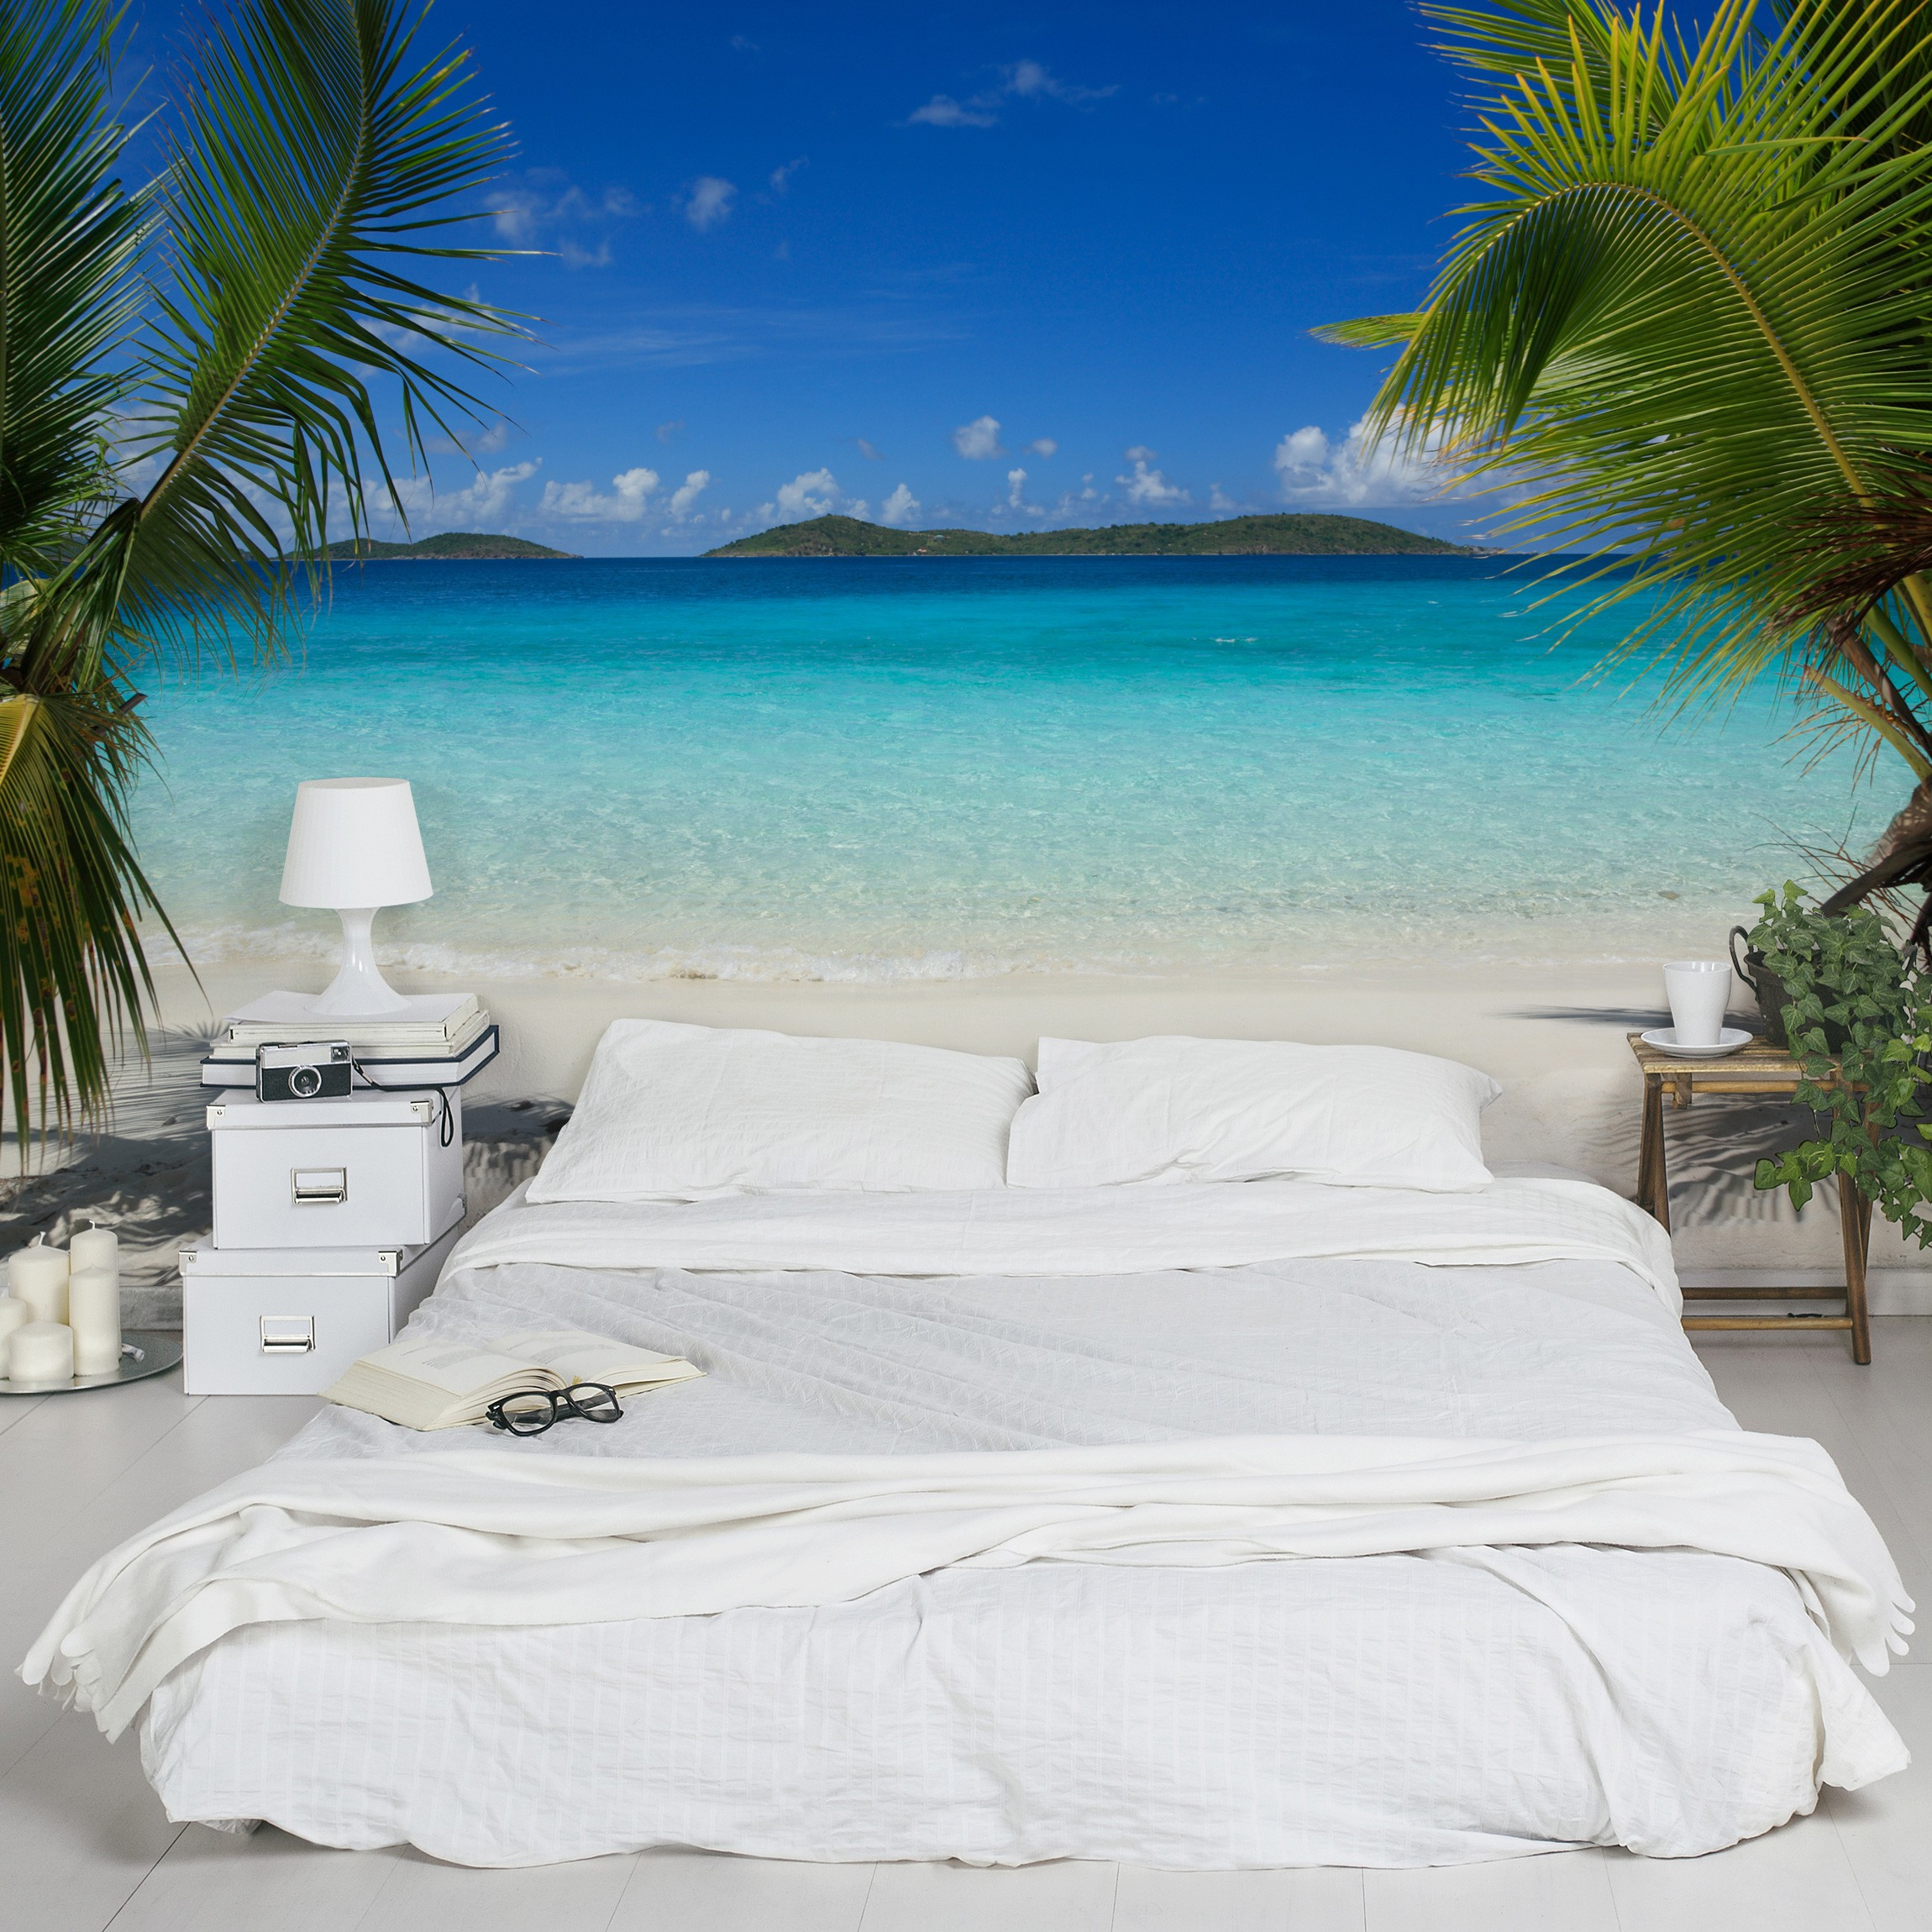 Full Size of 3d Fototapete Karibik Perfect Maledives Vliestapete Premium Breit Wohnzimmer Schlafzimmer Fenster Fototapeten Küche Wohnzimmer 3d Fototapete